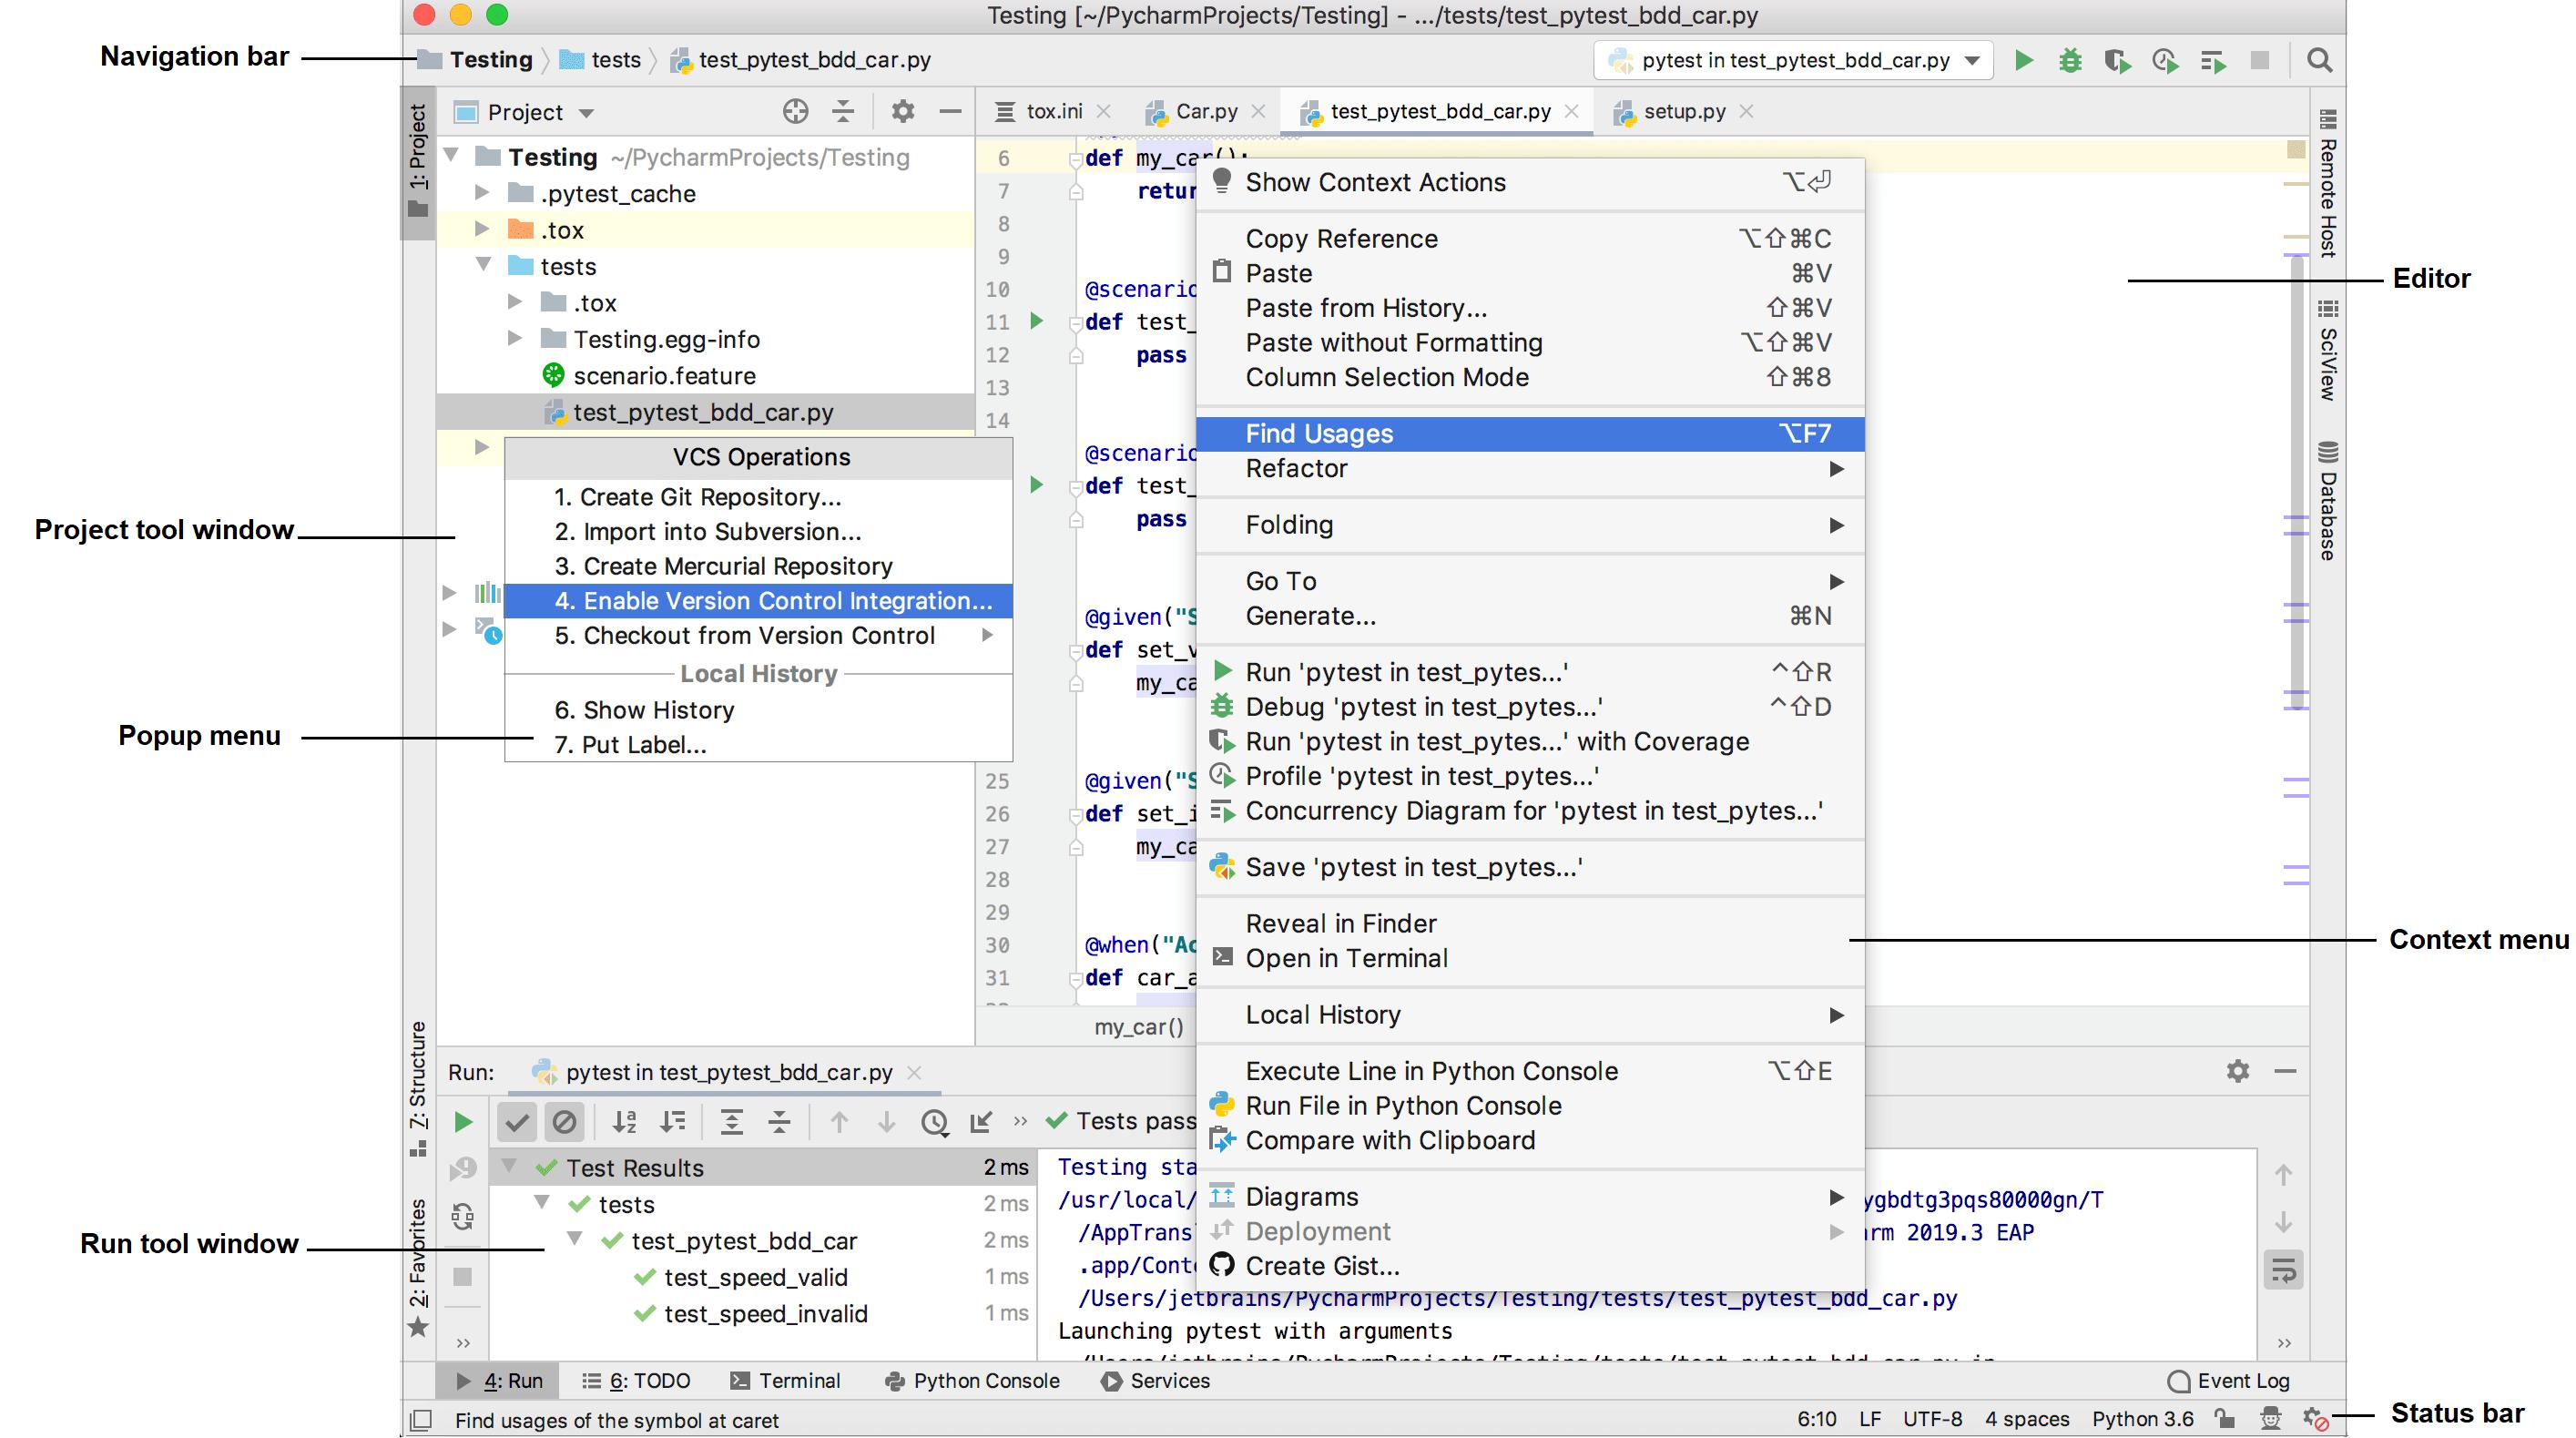 PyCharmをインストールする - 公式ヘルプ | PyCharm